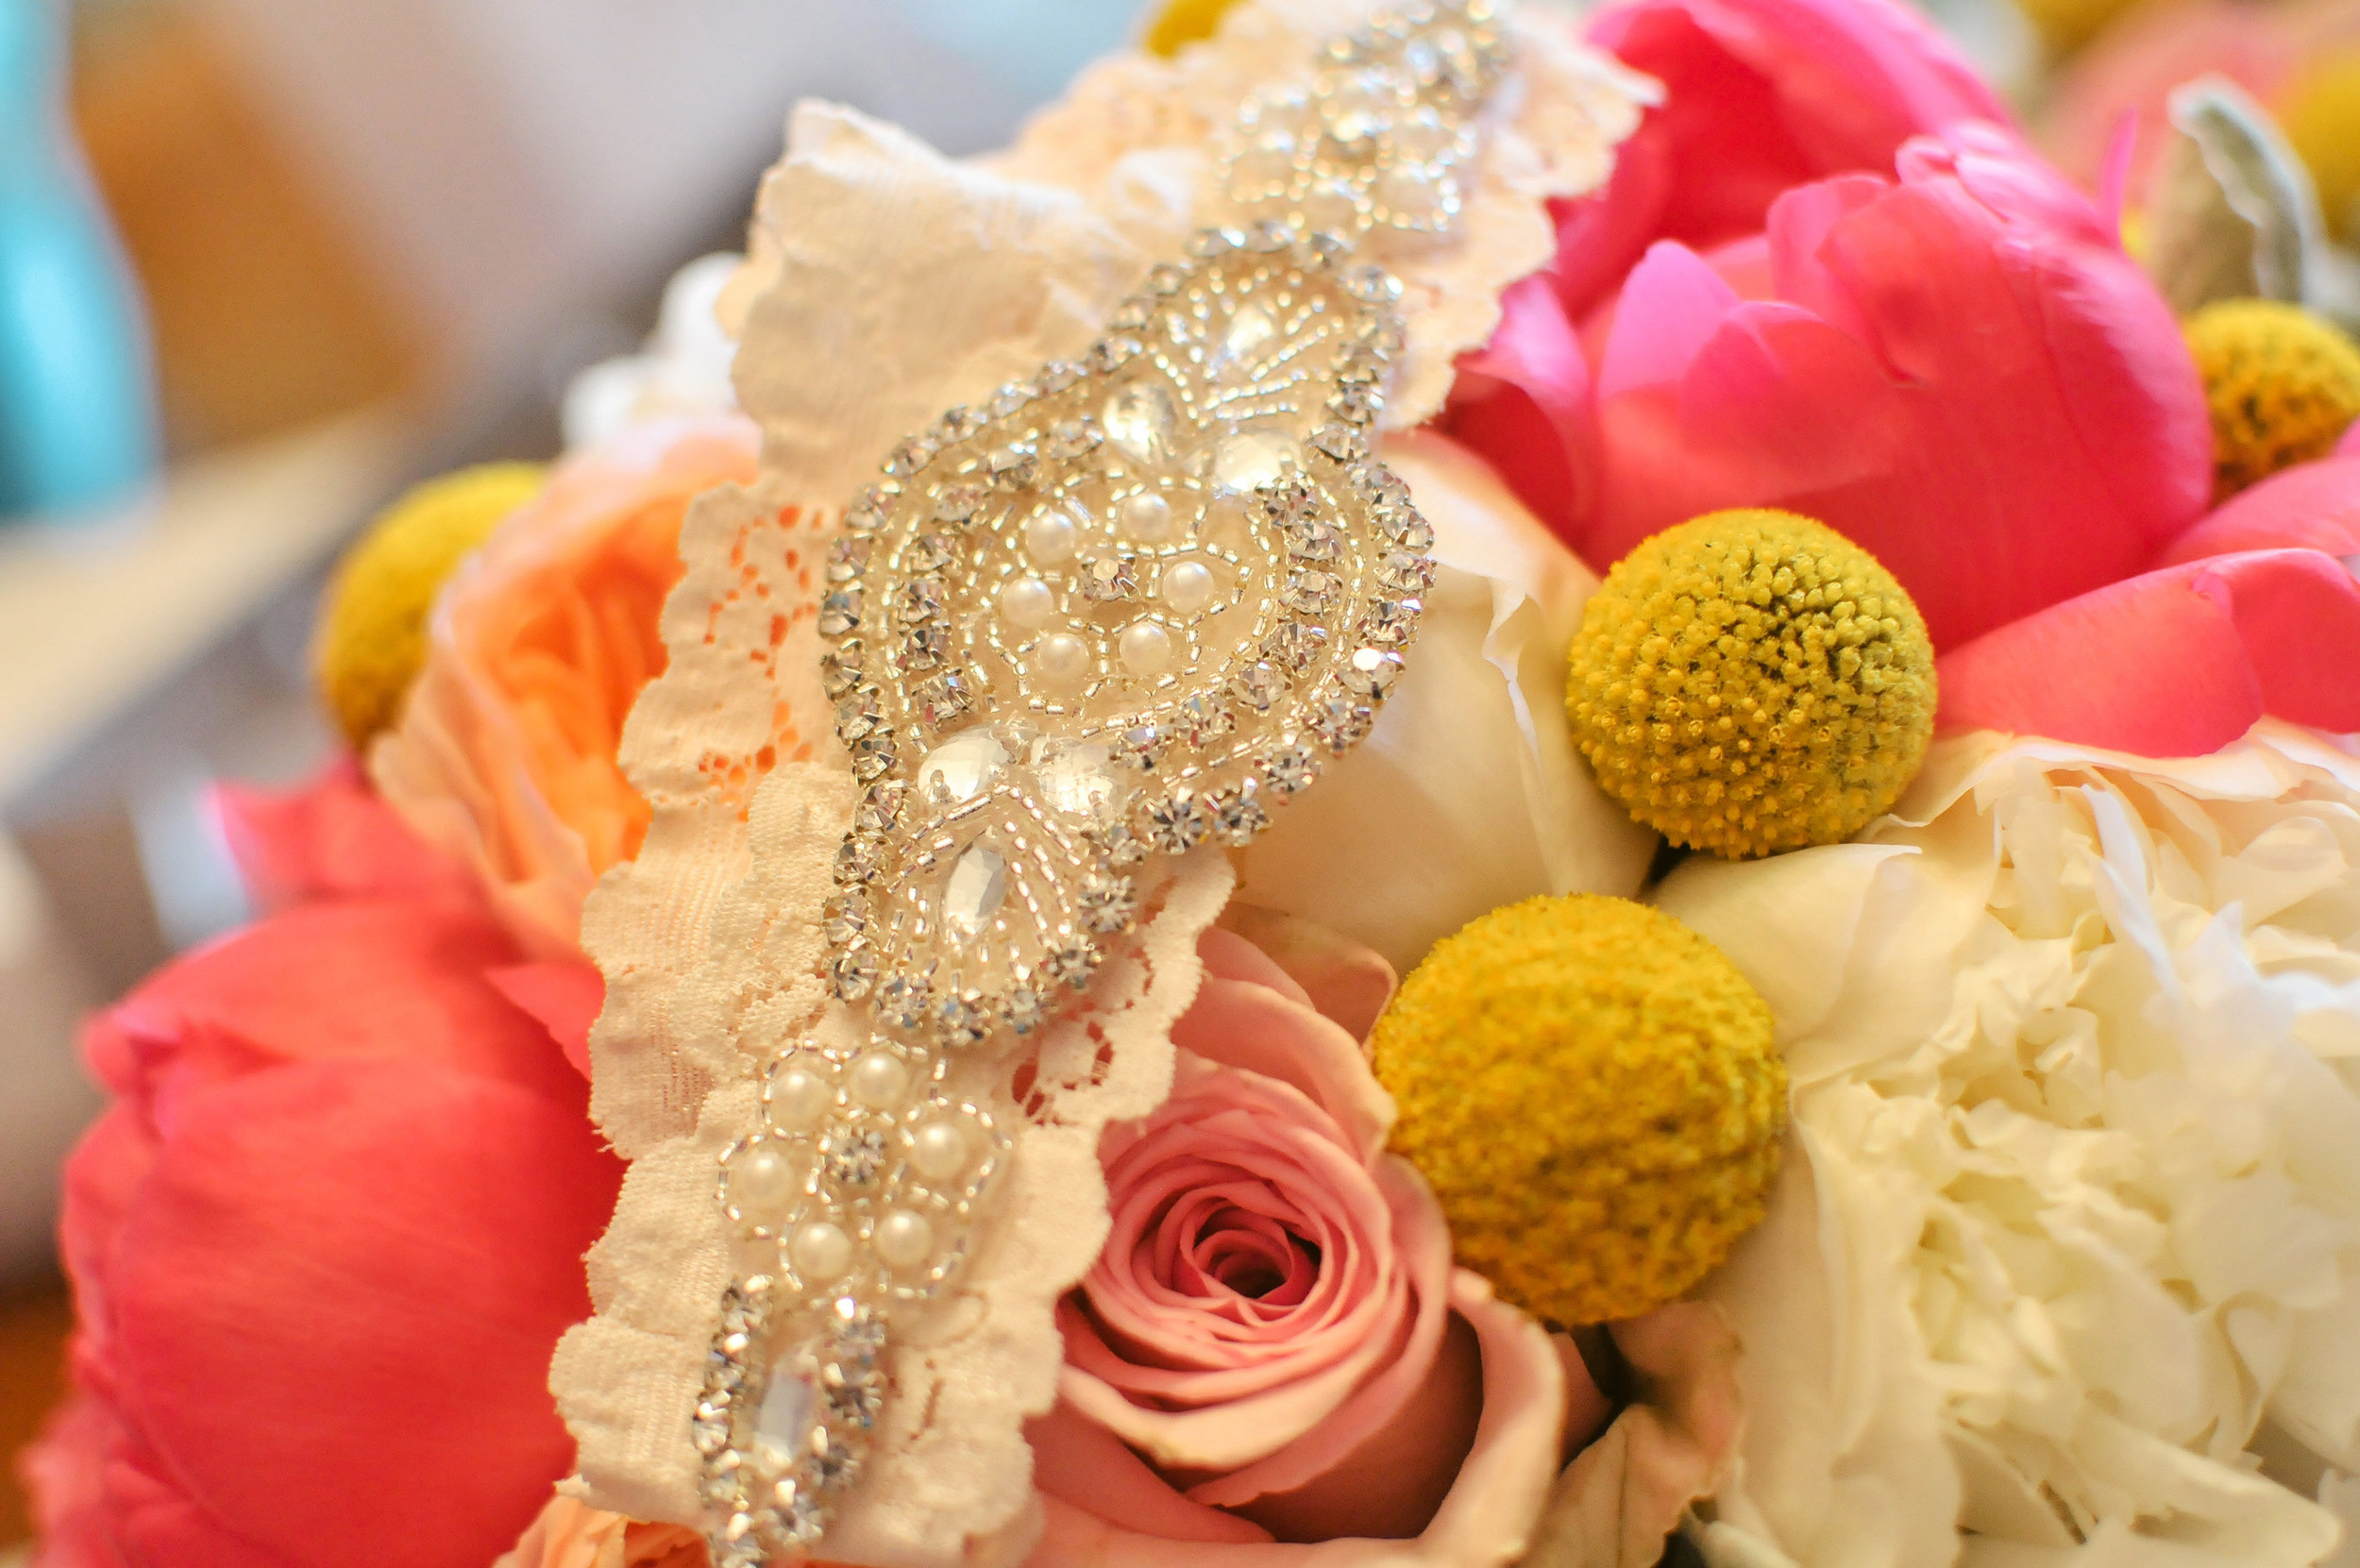 cornerstone-buidling-peoria-wedding-photographer-5.jpg